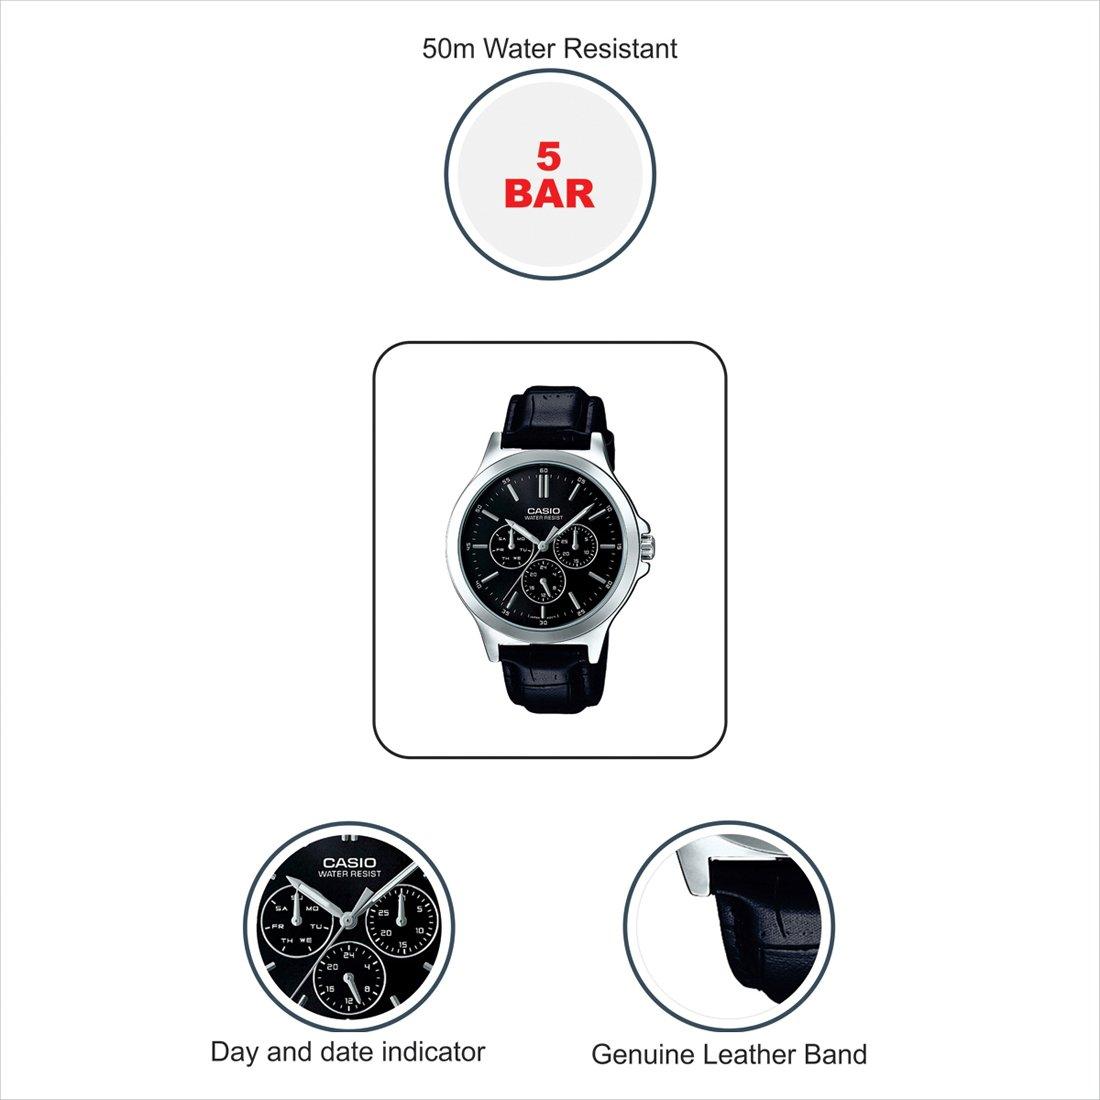 Amazon.com: Casio Multi-Dial Black Leather Mens Watch MTP-V300L-1AV: Watches